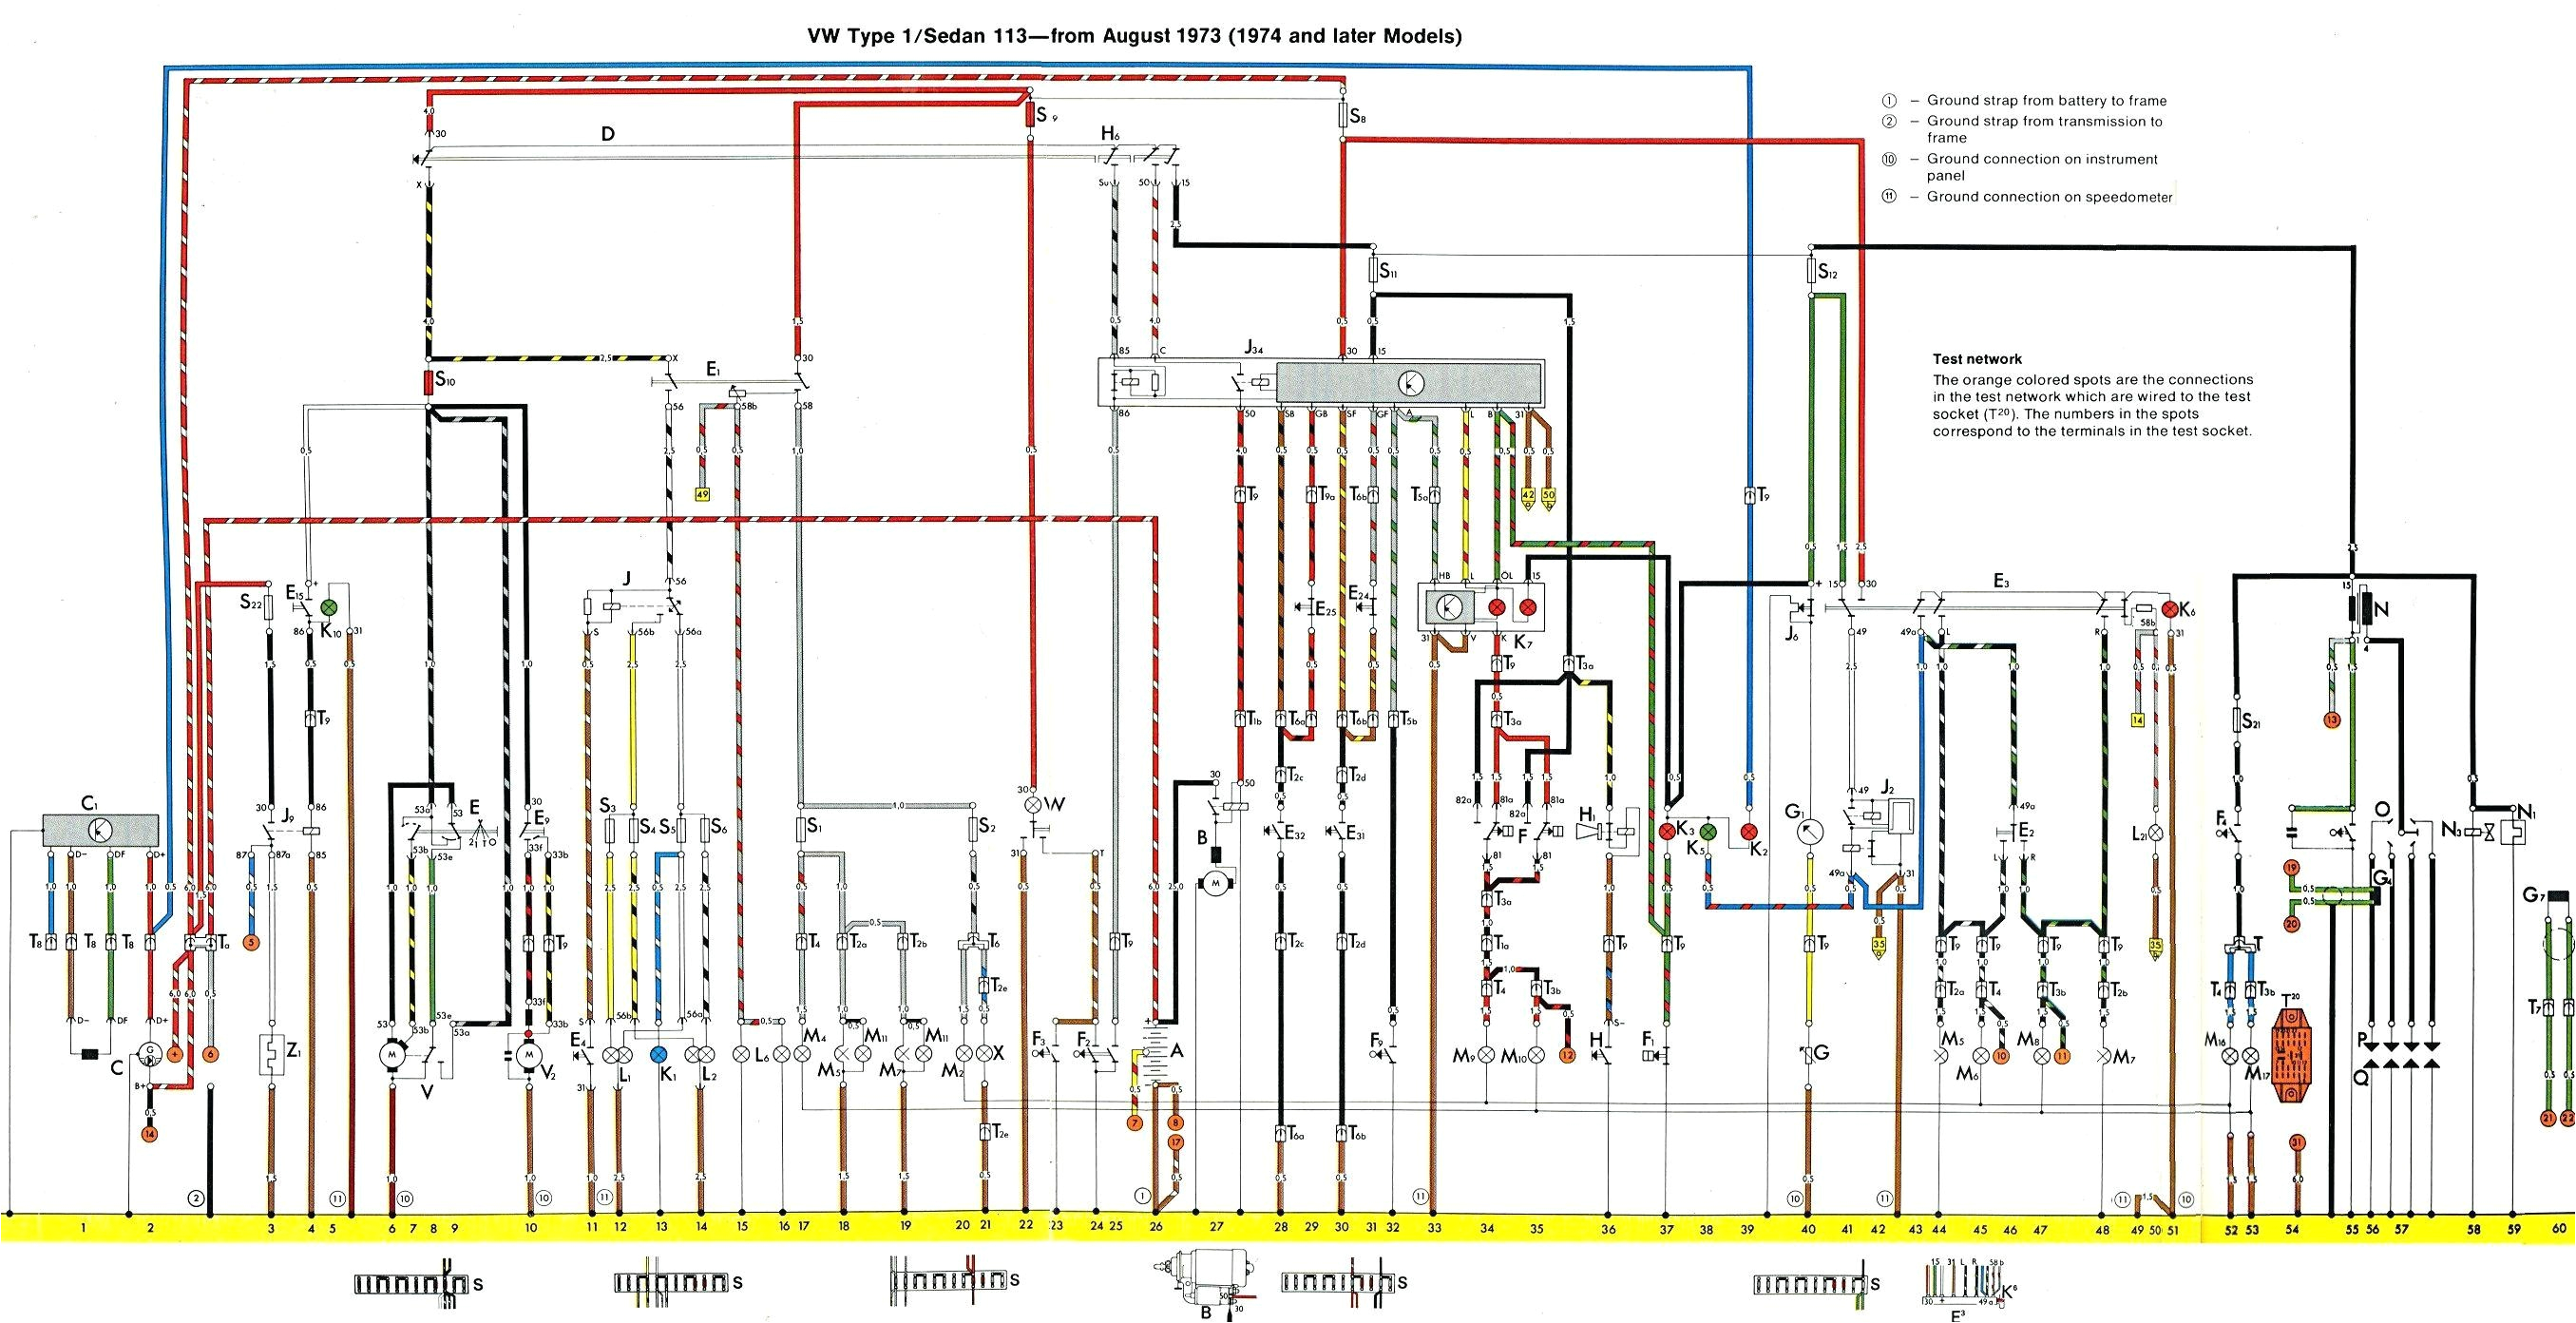 vw derby 2 0 engine diagram wiring diagram repair guides03 jetta 2 0 engine diagram wiring